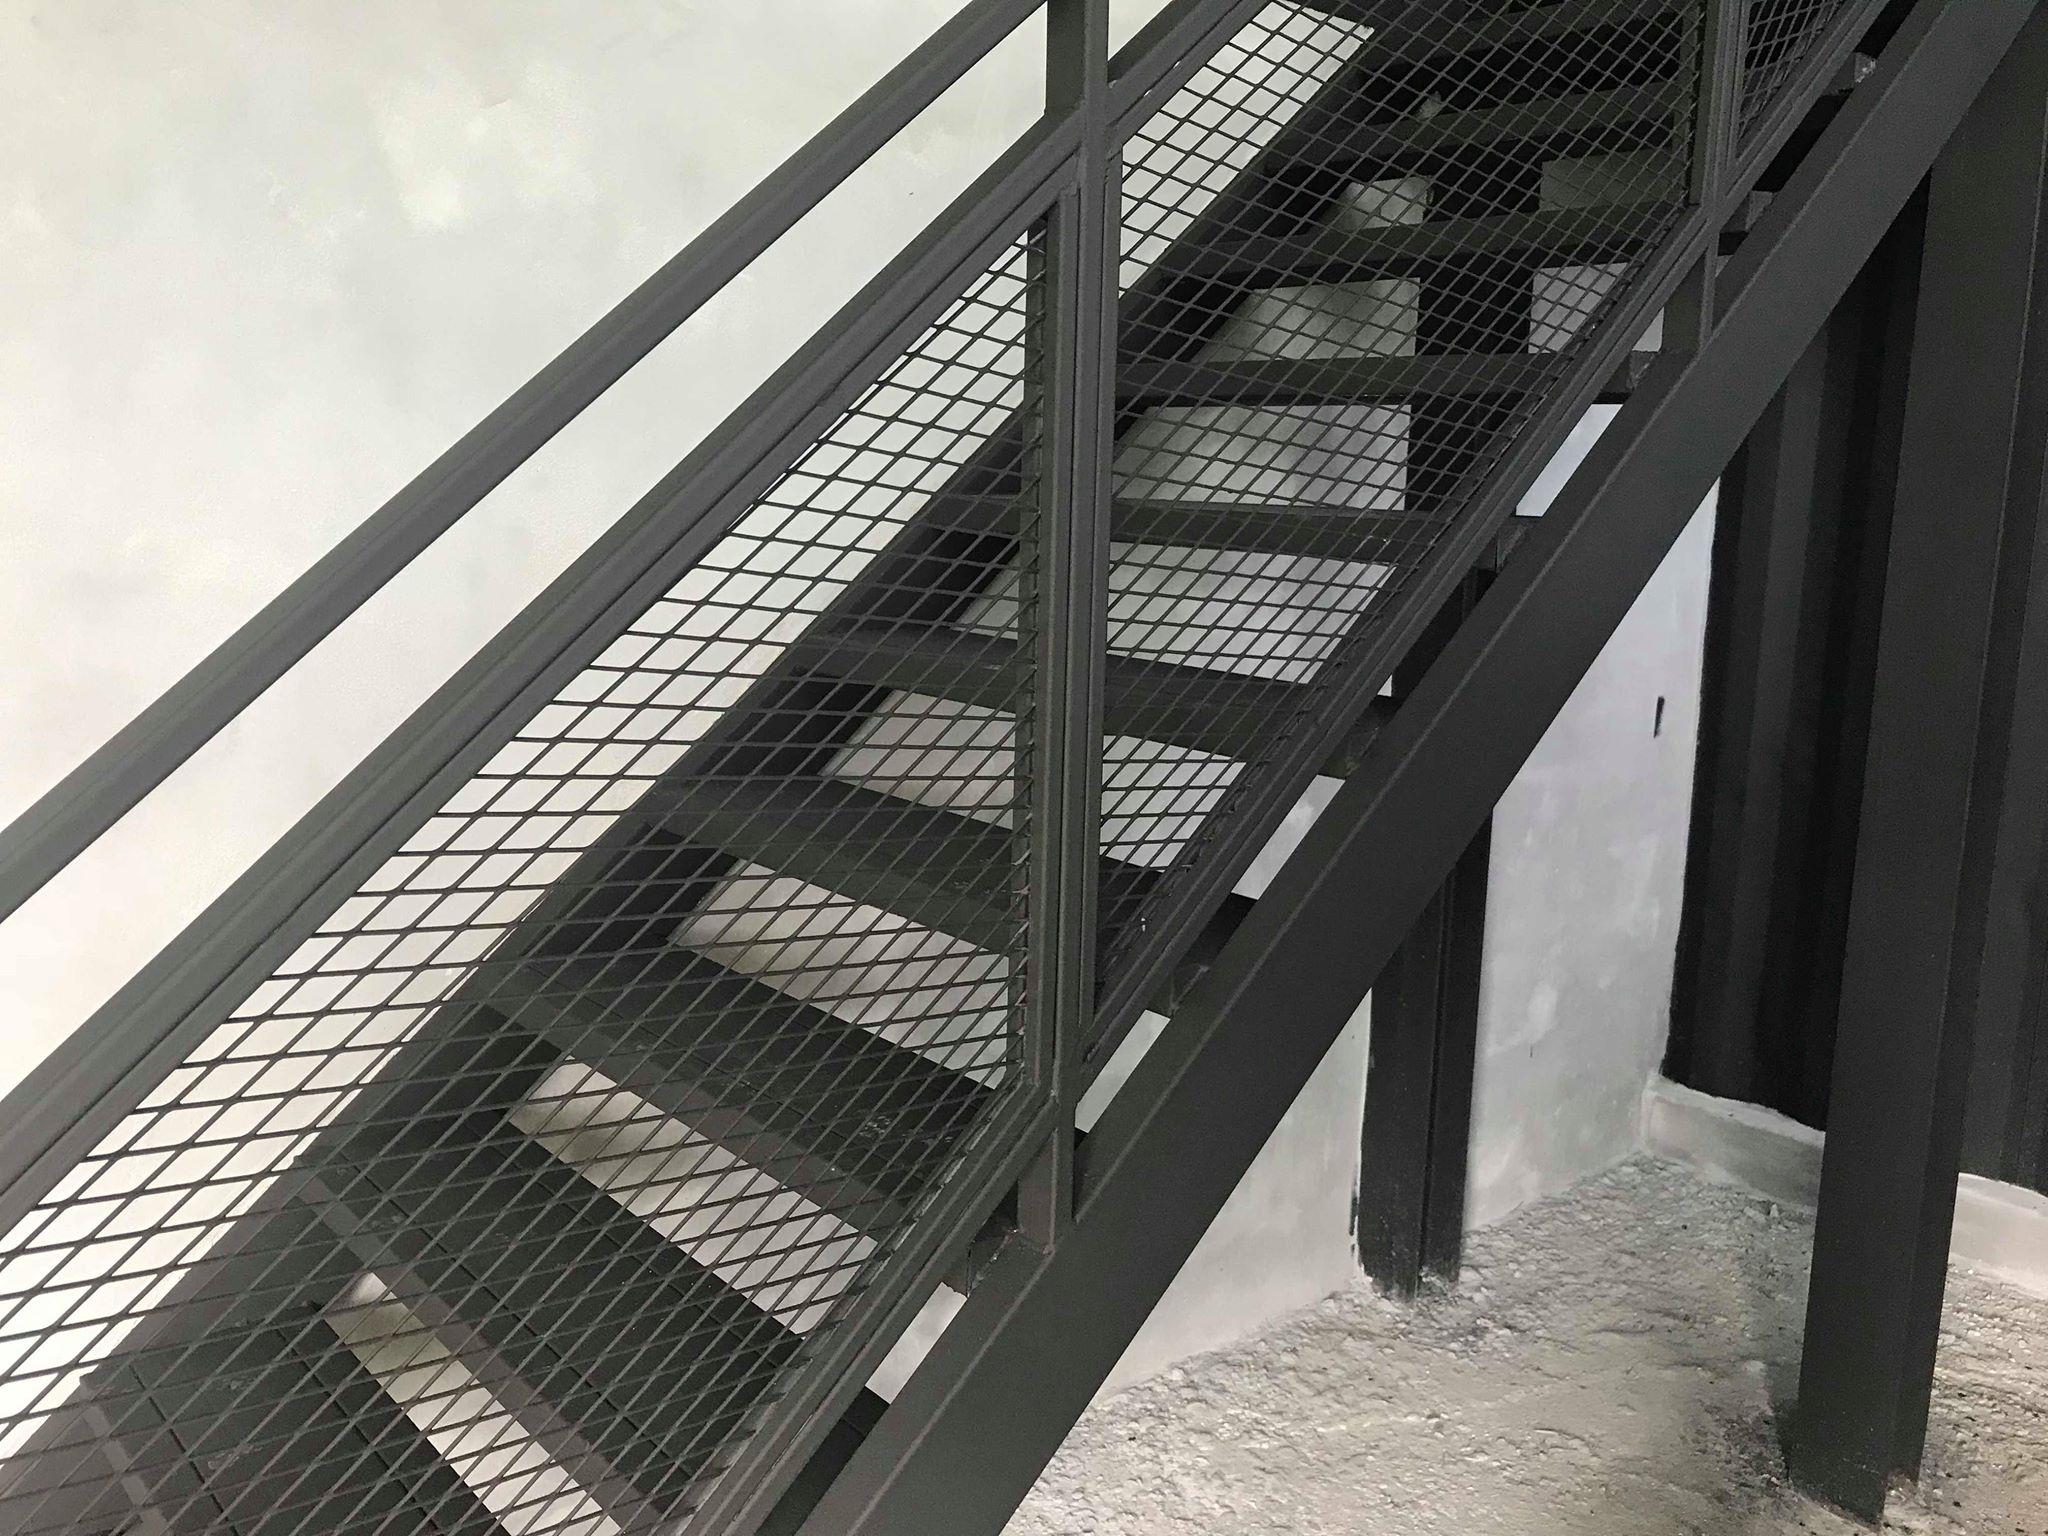 Stairs next to cinema demo room